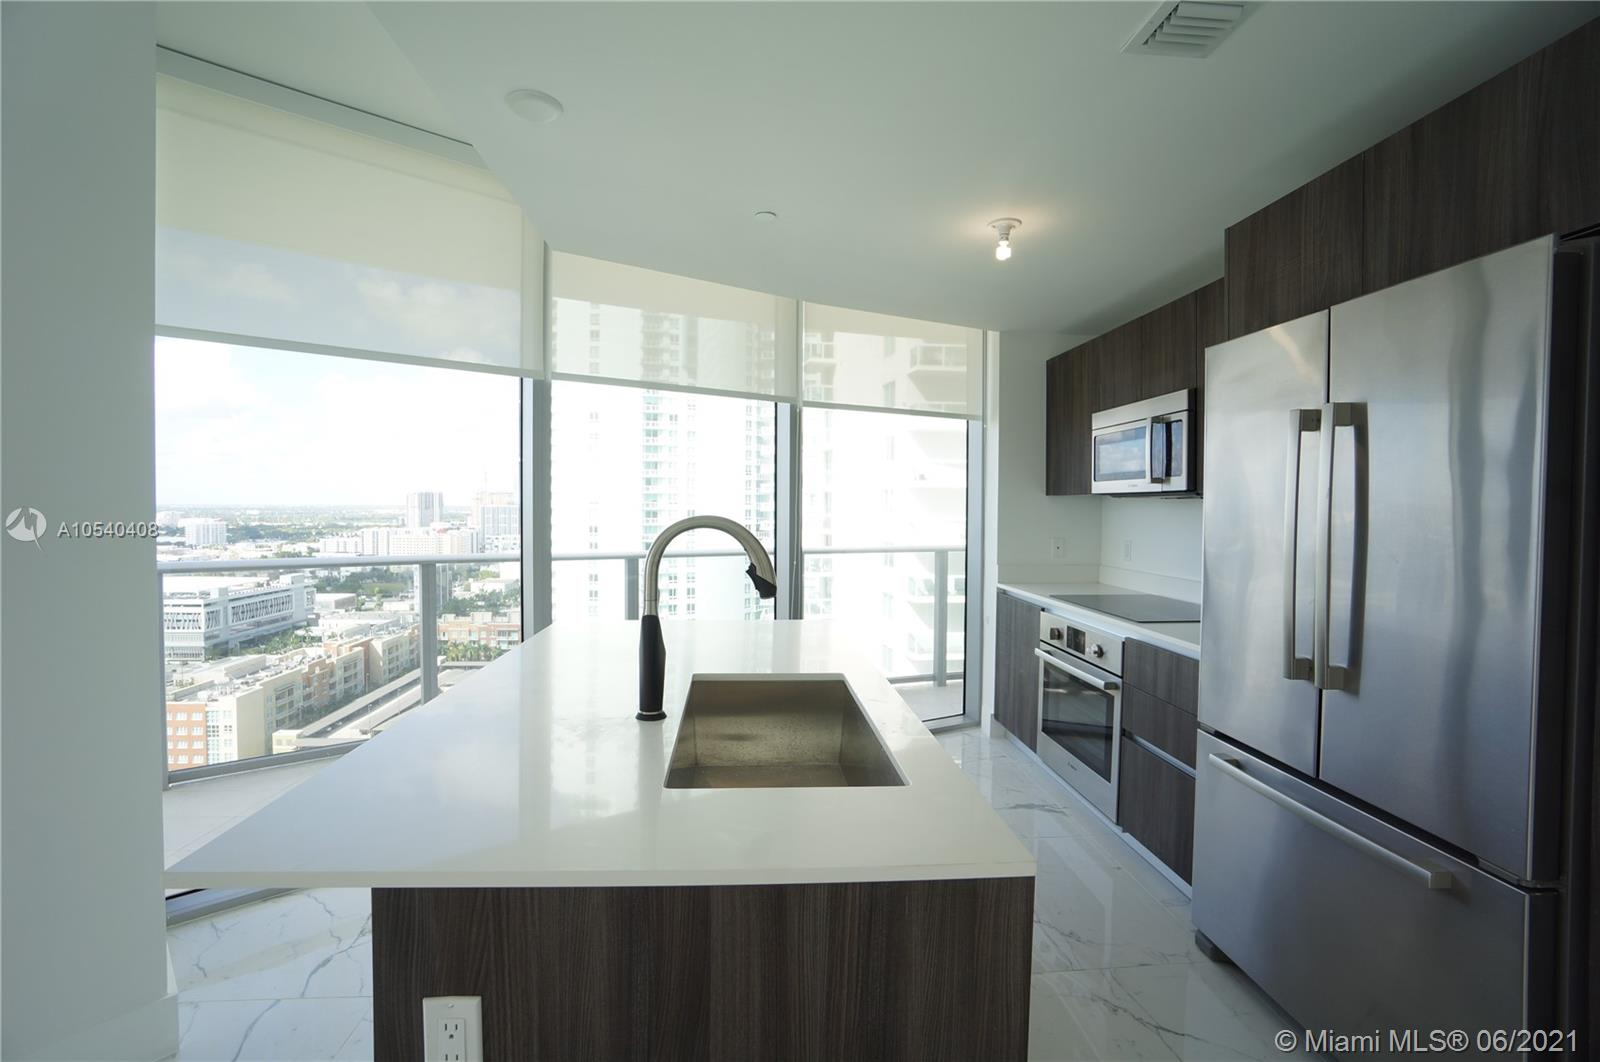 488 NE 18 ST # 2401, Miami, Florida 33132, 2 Bedrooms Bedrooms, ,3 BathroomsBathrooms,Residential,For Sale,488 NE 18 ST # 2401,A10540408